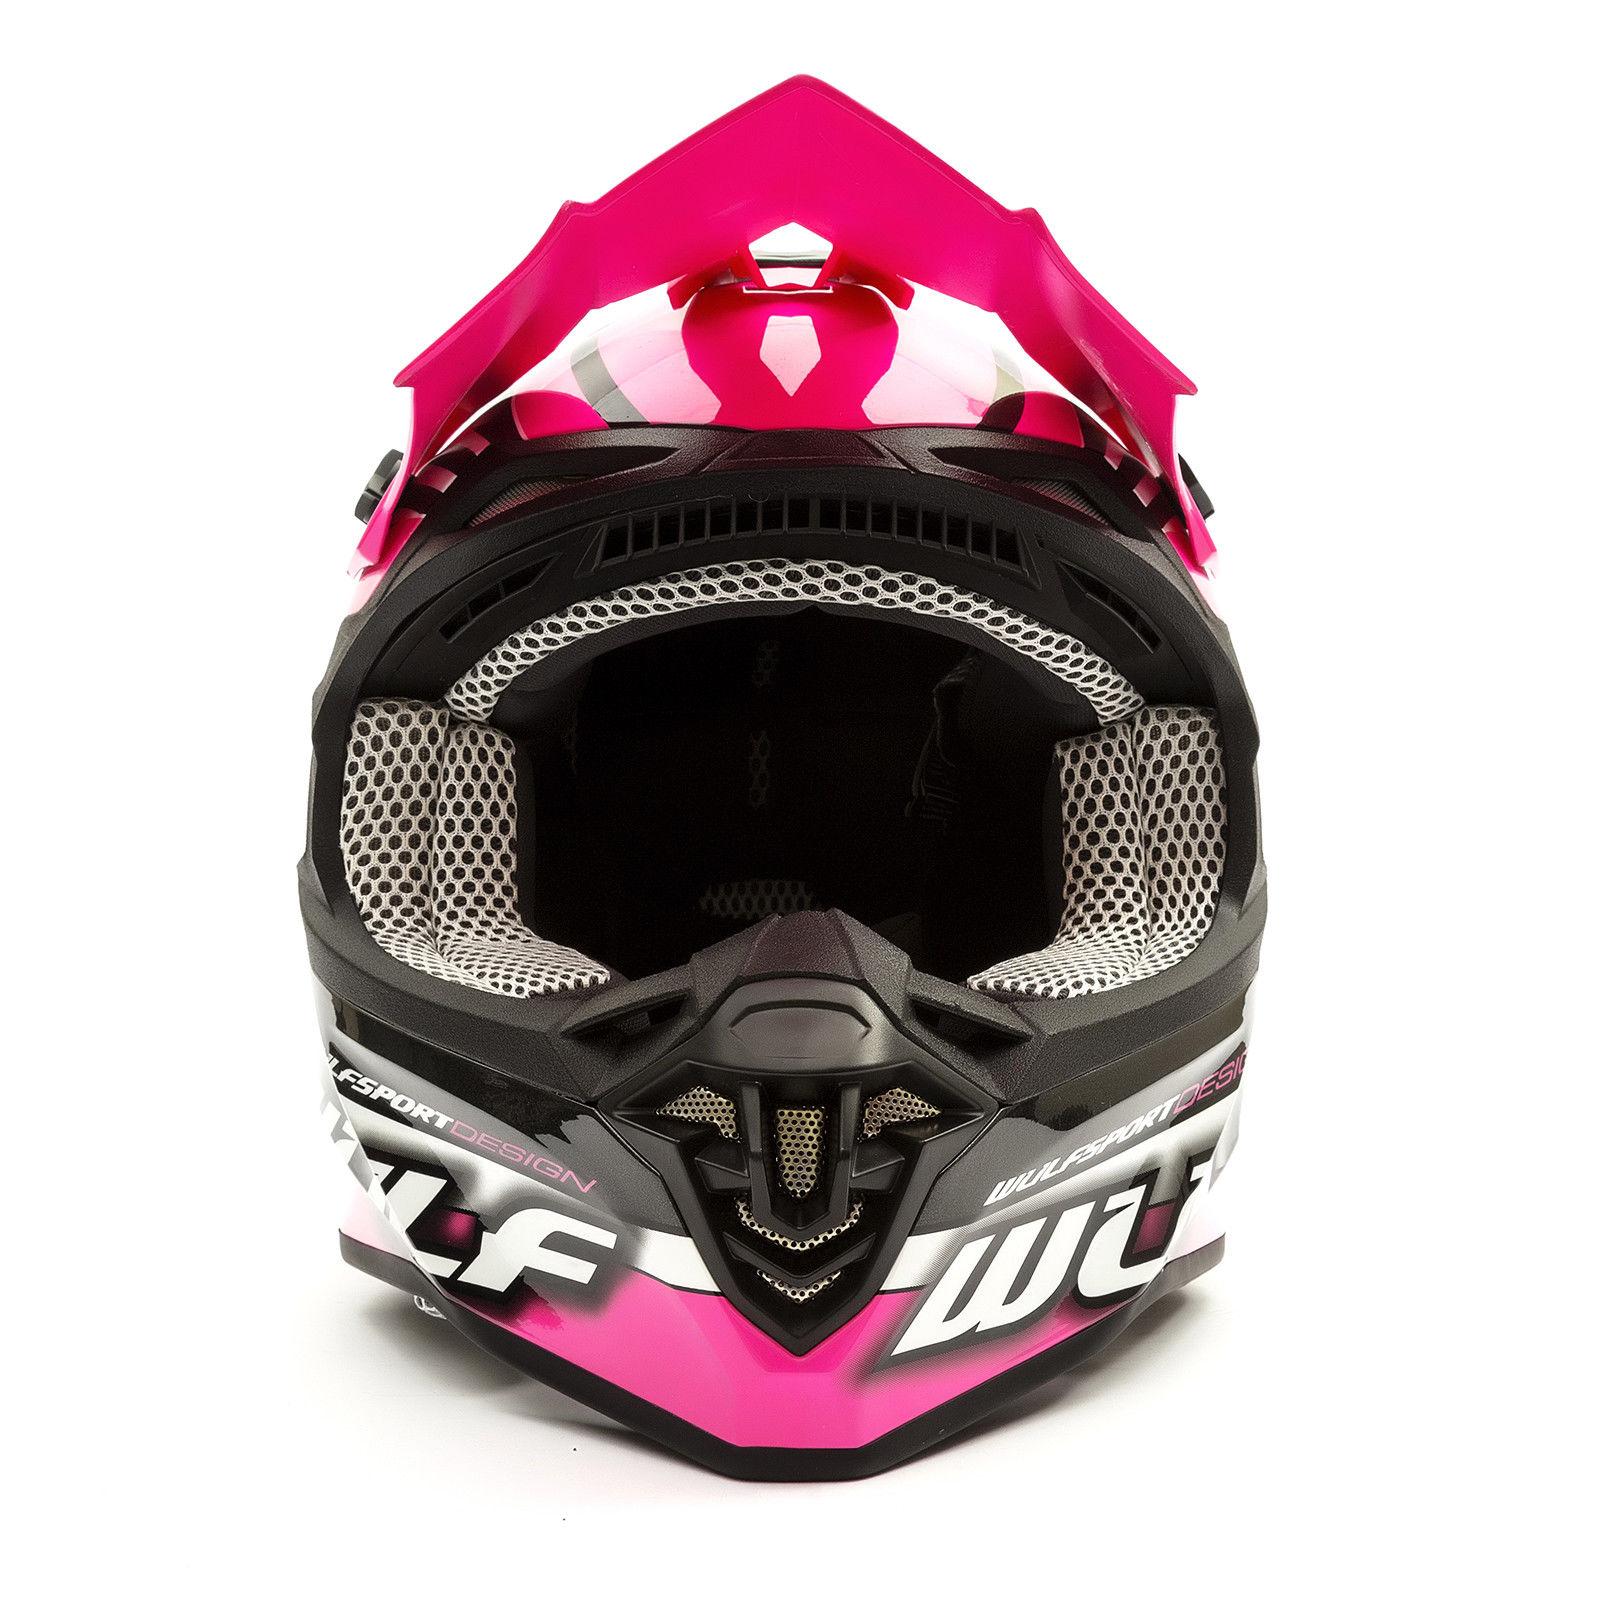 Wulfsport-Adult-Sceptre-Helmets-Motocross-Pitbike-Motorbike-Off-Road-Racing-ATV thumbnail 50